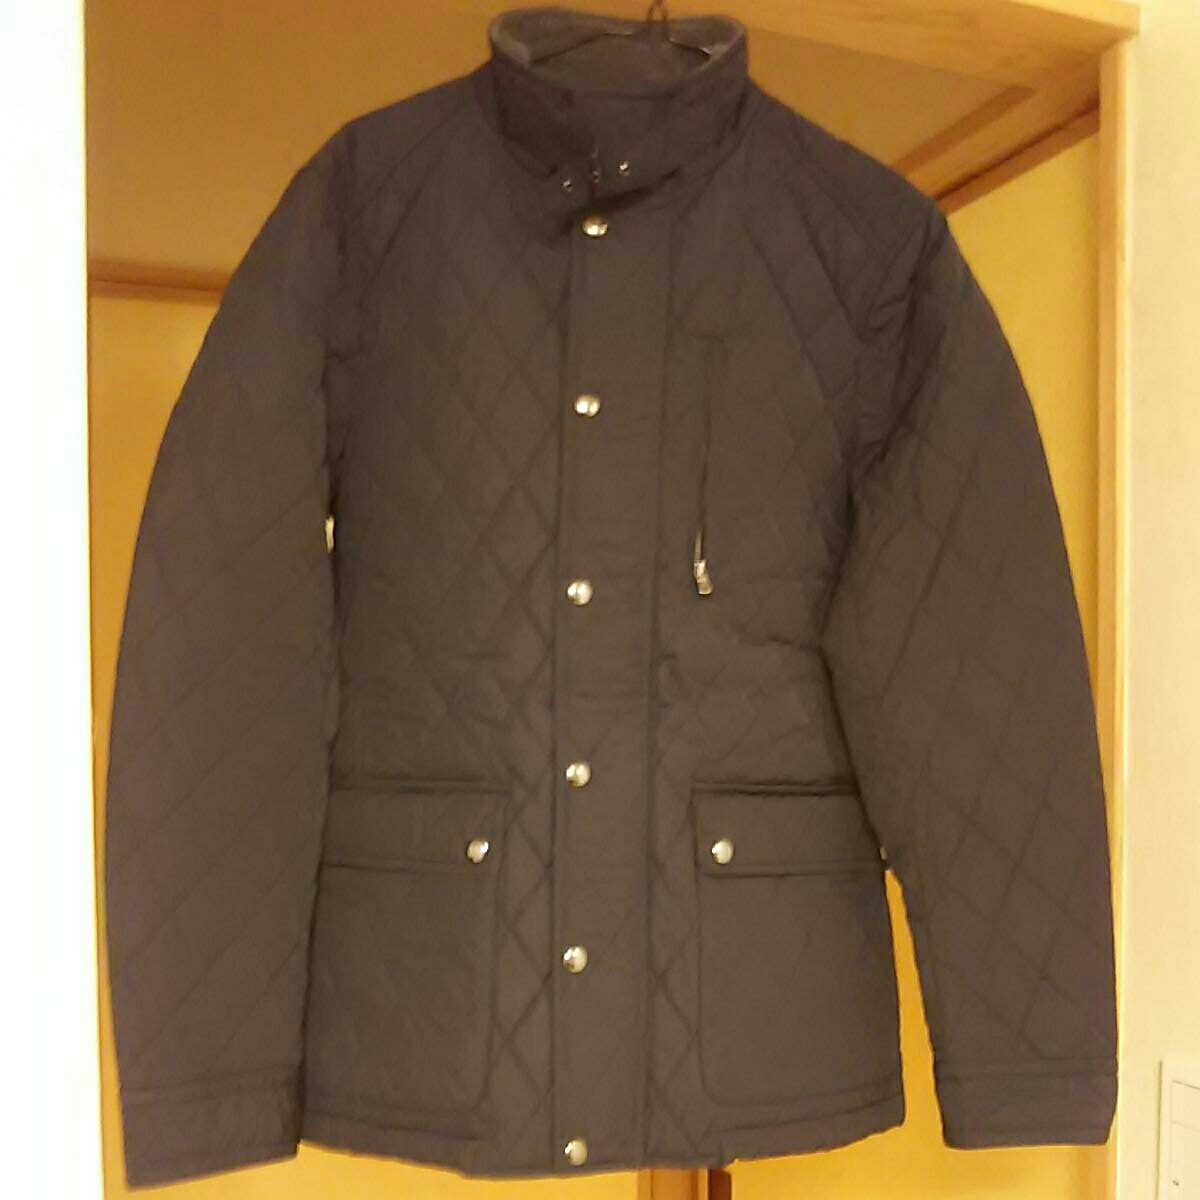 UNITED ARROWS ユナイテッドアローズ ジャケット ジャンパー Sサイズ